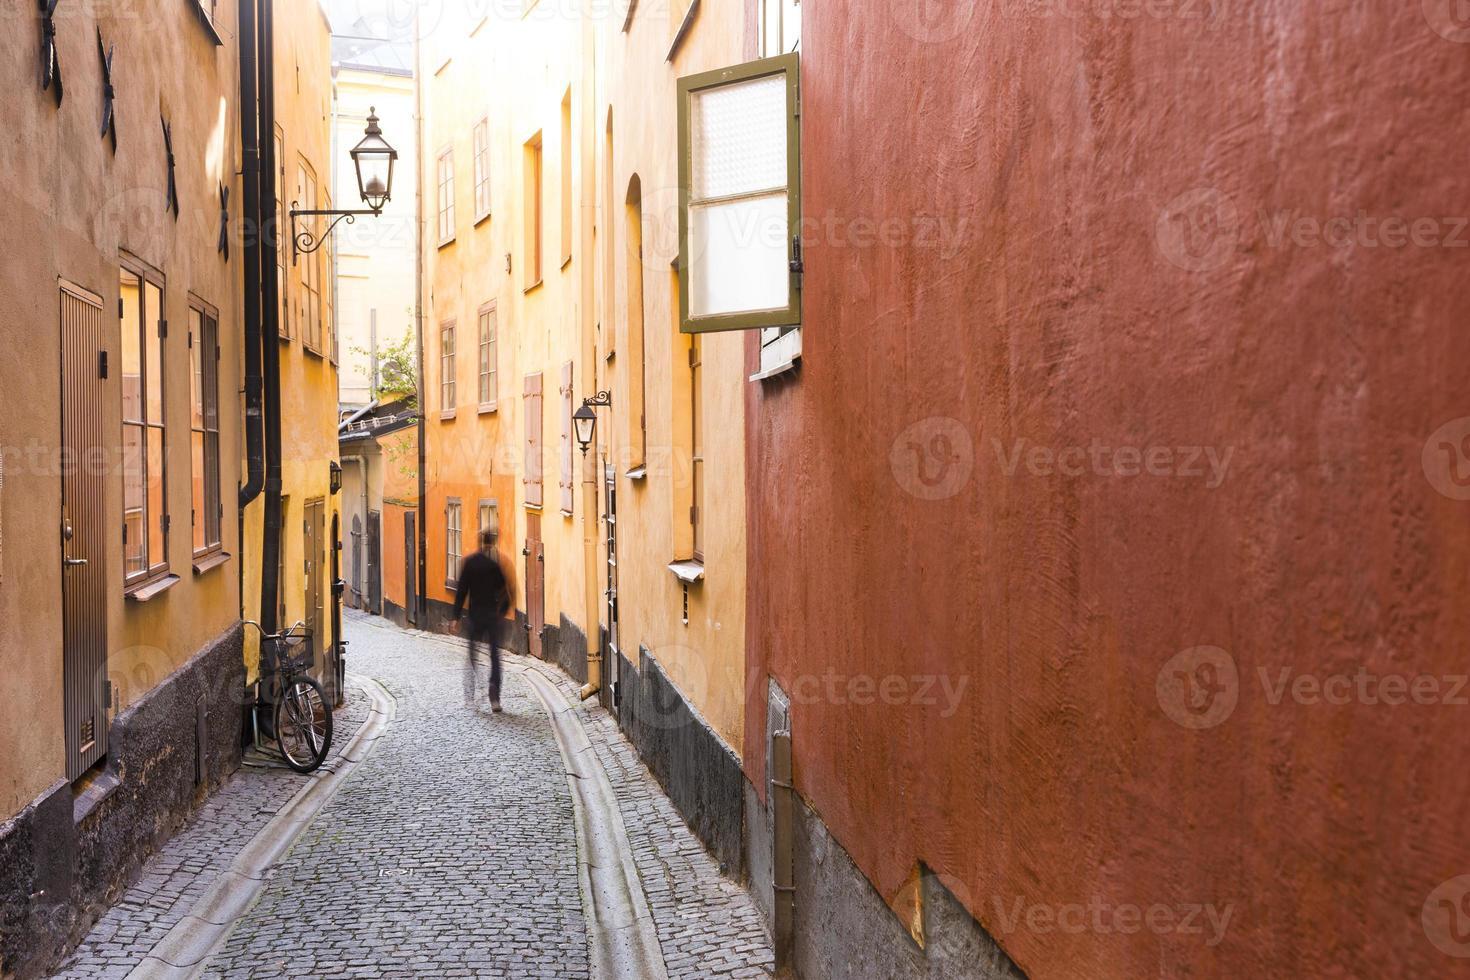 smal straatje in het oude centrum van stockholm foto